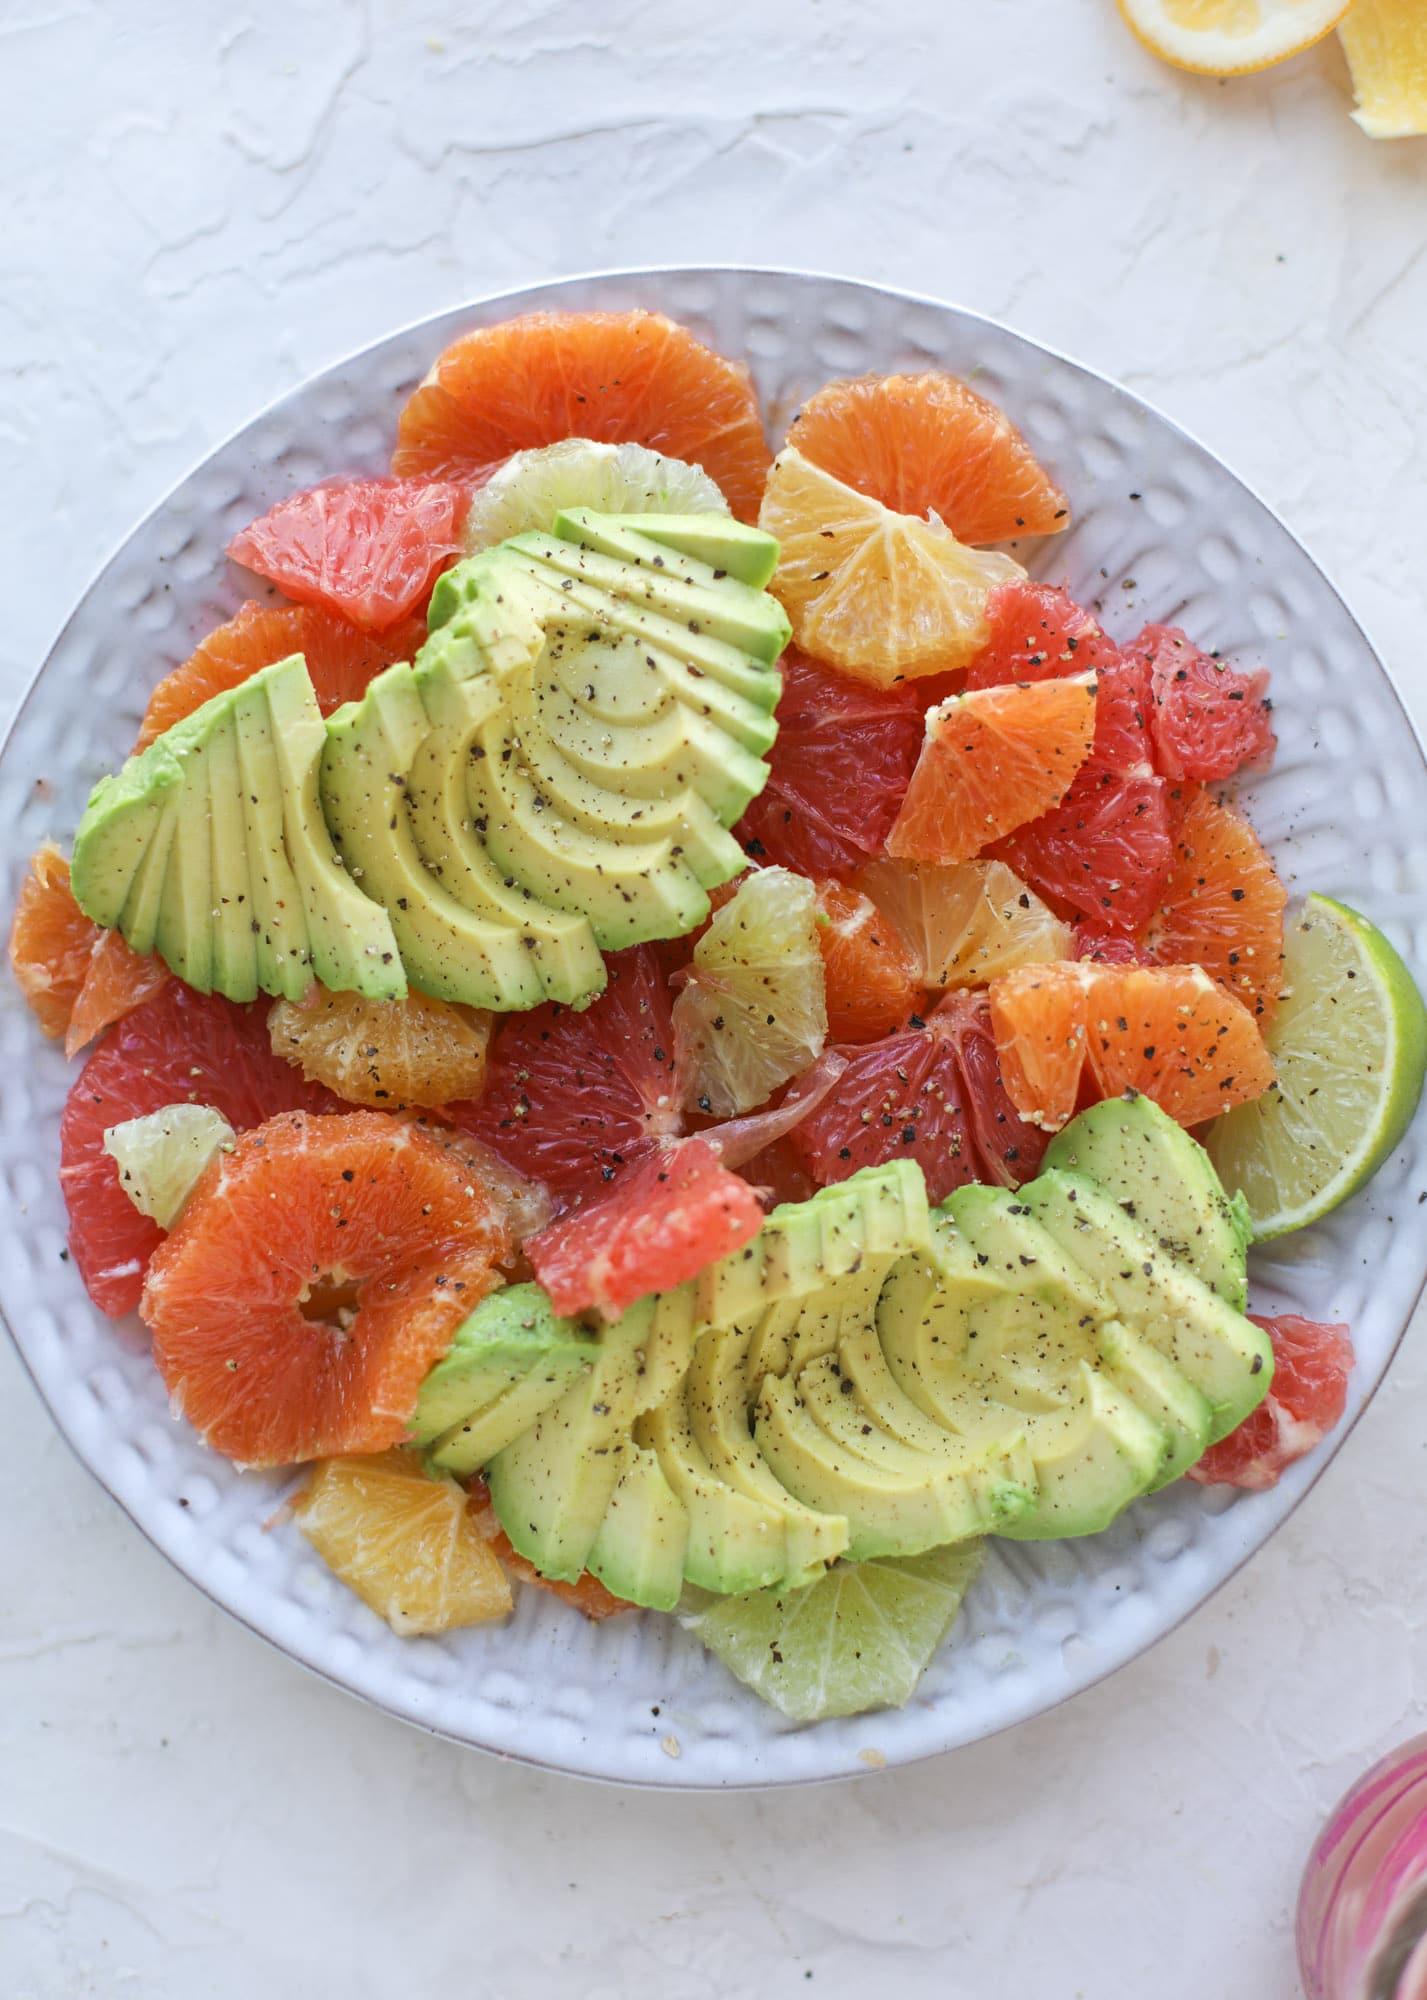 A deliciously fresh and invigorating avocado citrus salad with honey lime vinaigrette. It's creamy, tart, sweet and refreshing! I howsweeteats.com #avocado #citrussalad